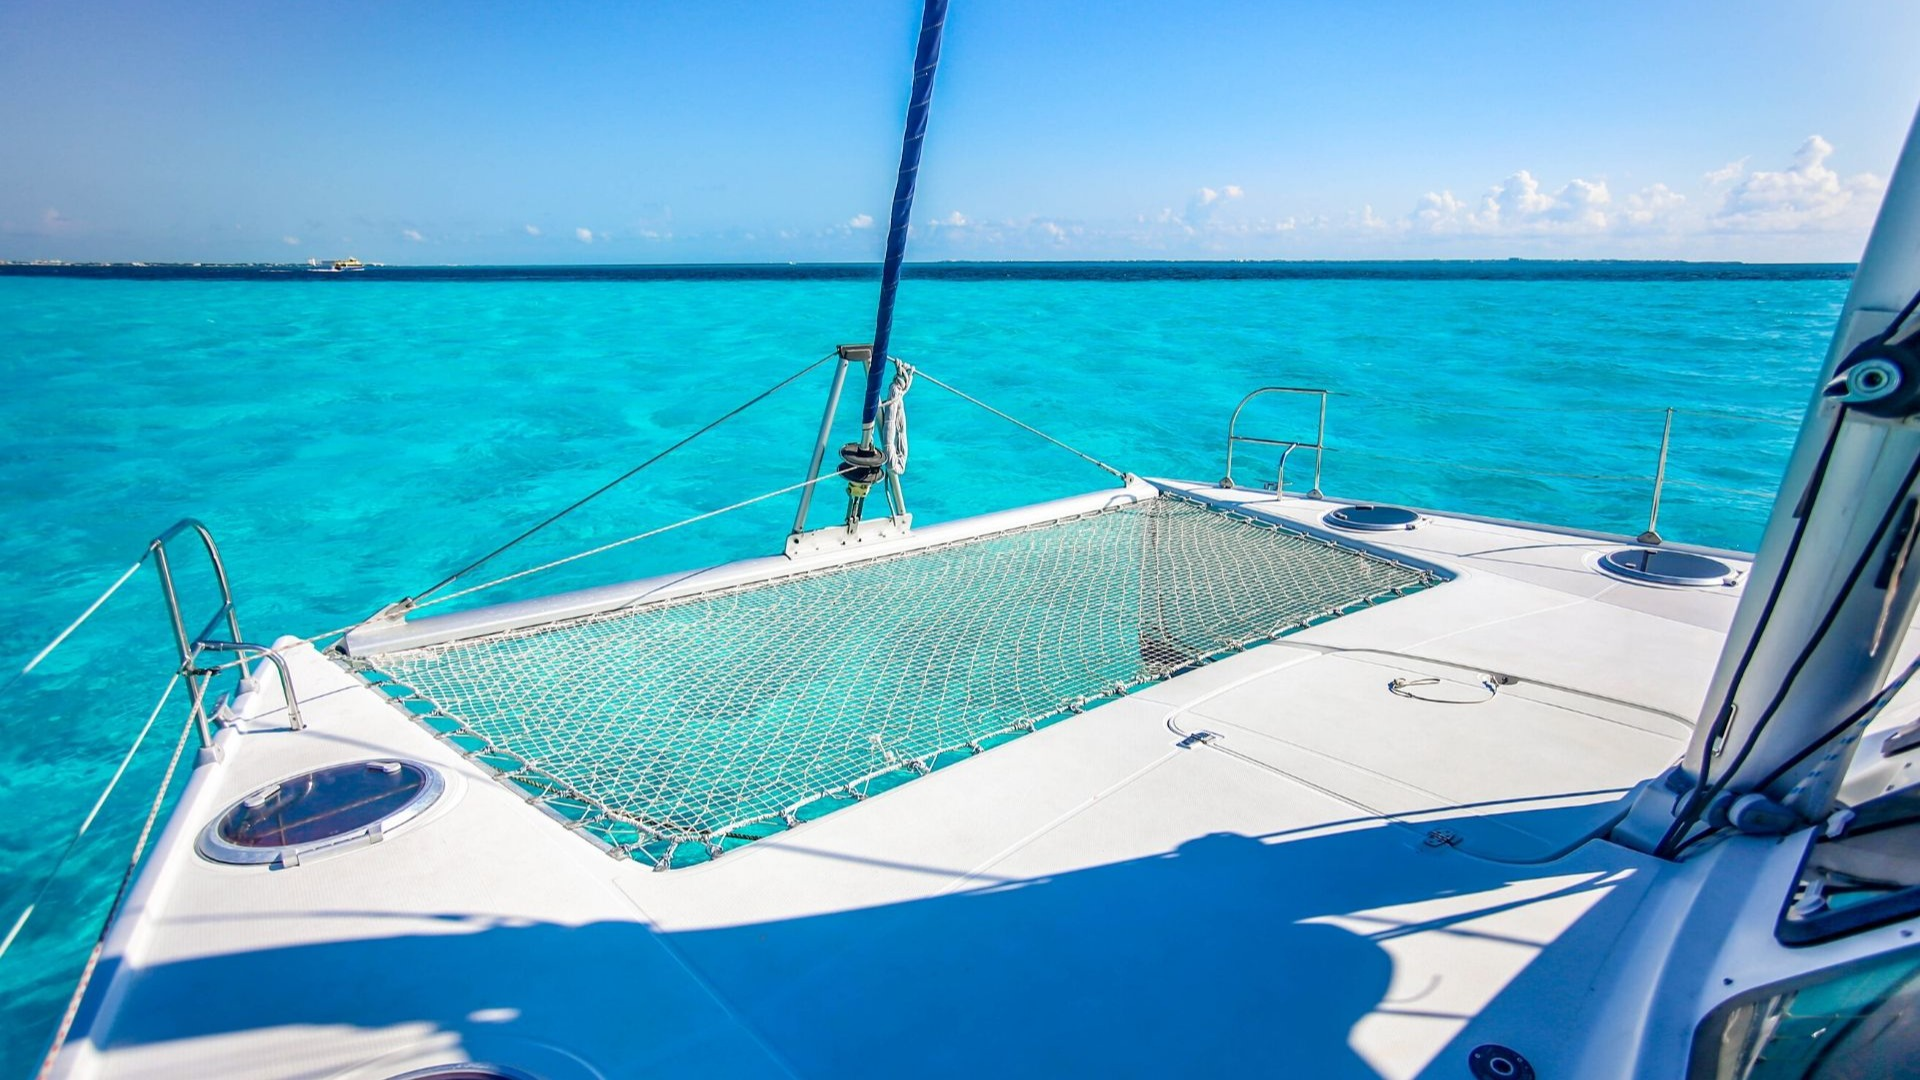 2 - LoRes - Kendo - Isla Mujeres Catamaran Tour - Cancun Sailing